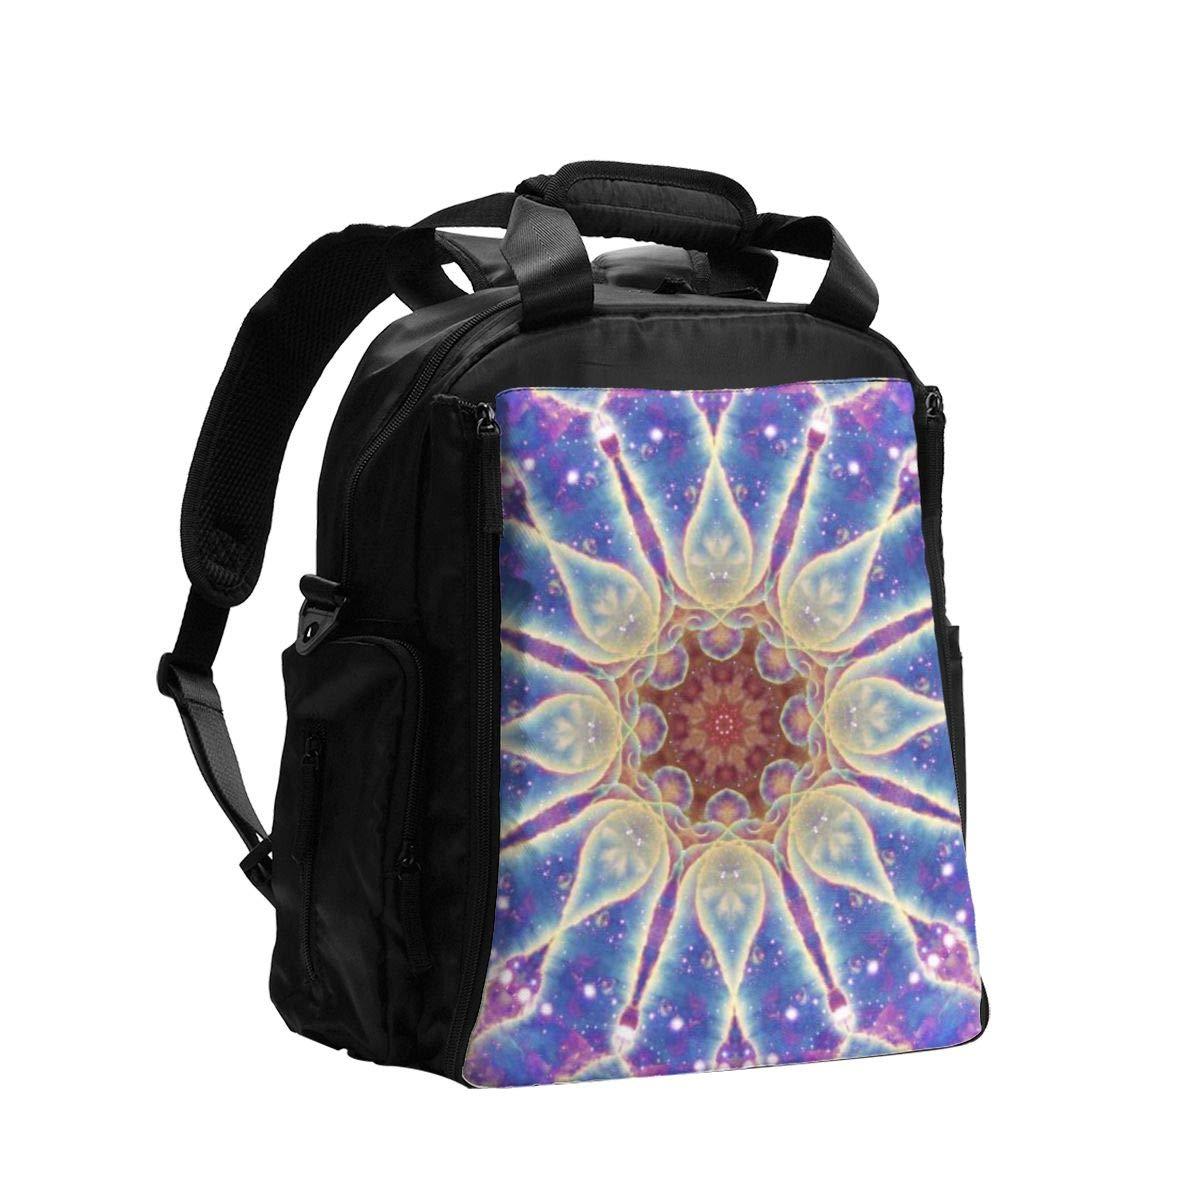 Mandala Diaper Bag Backpack,Baby Travel Nappy Back Pack